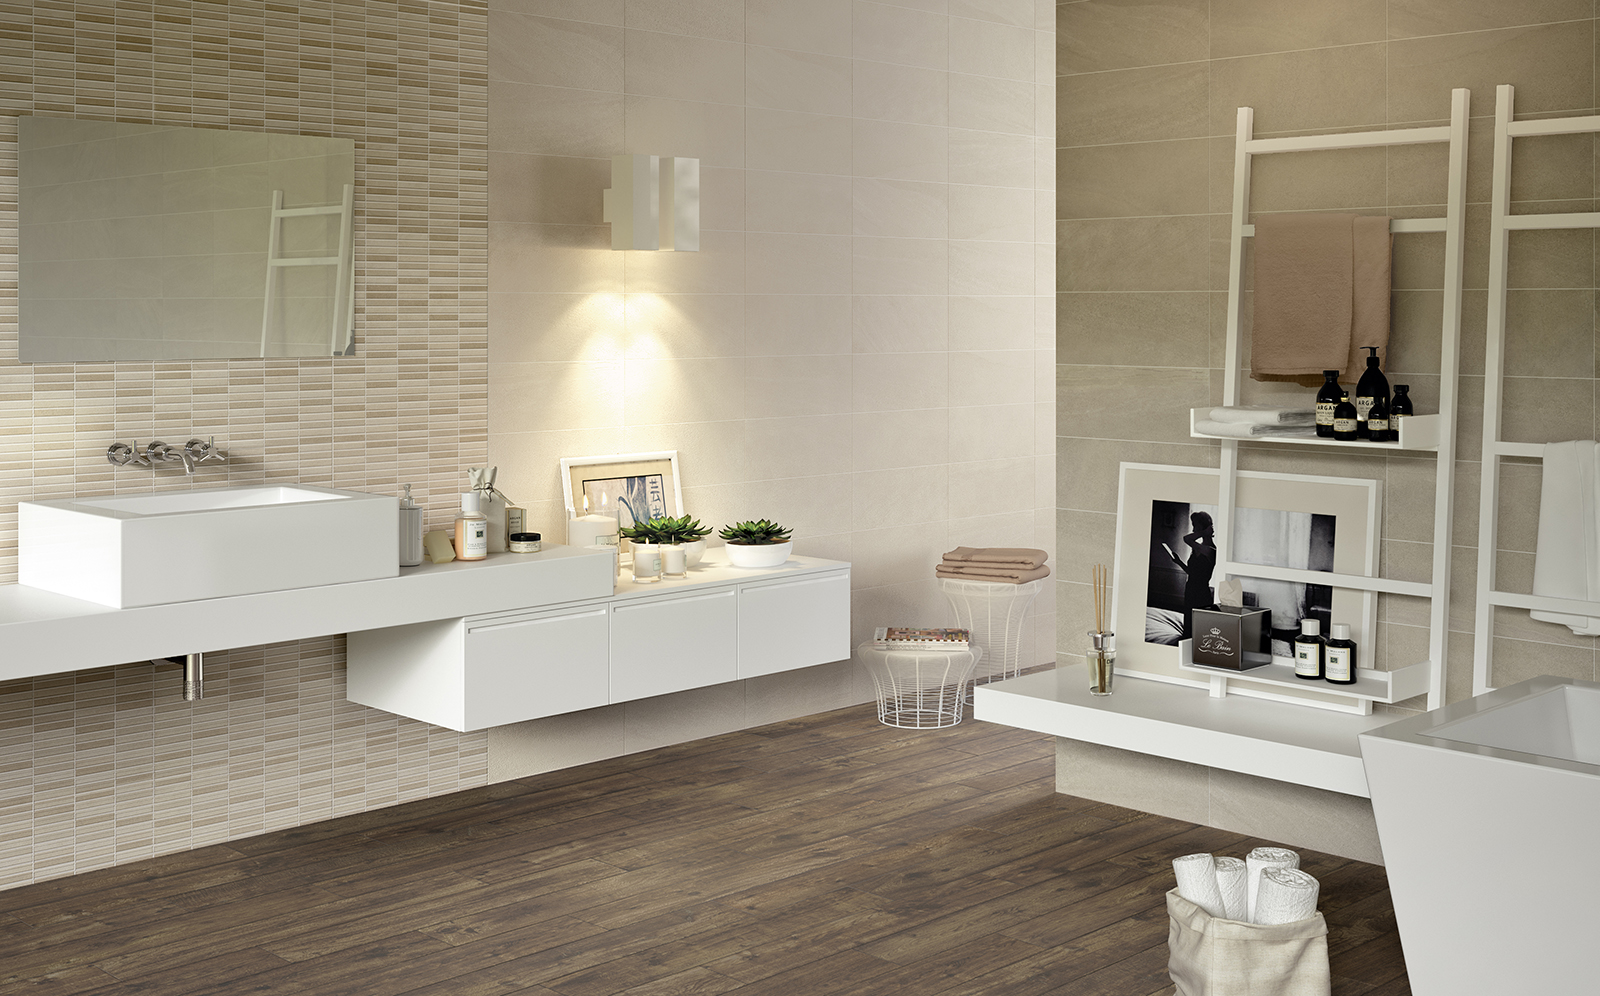 Interiors rivestimento bagno e cucina marazzi - Rivestimento piastrelle cucina ...